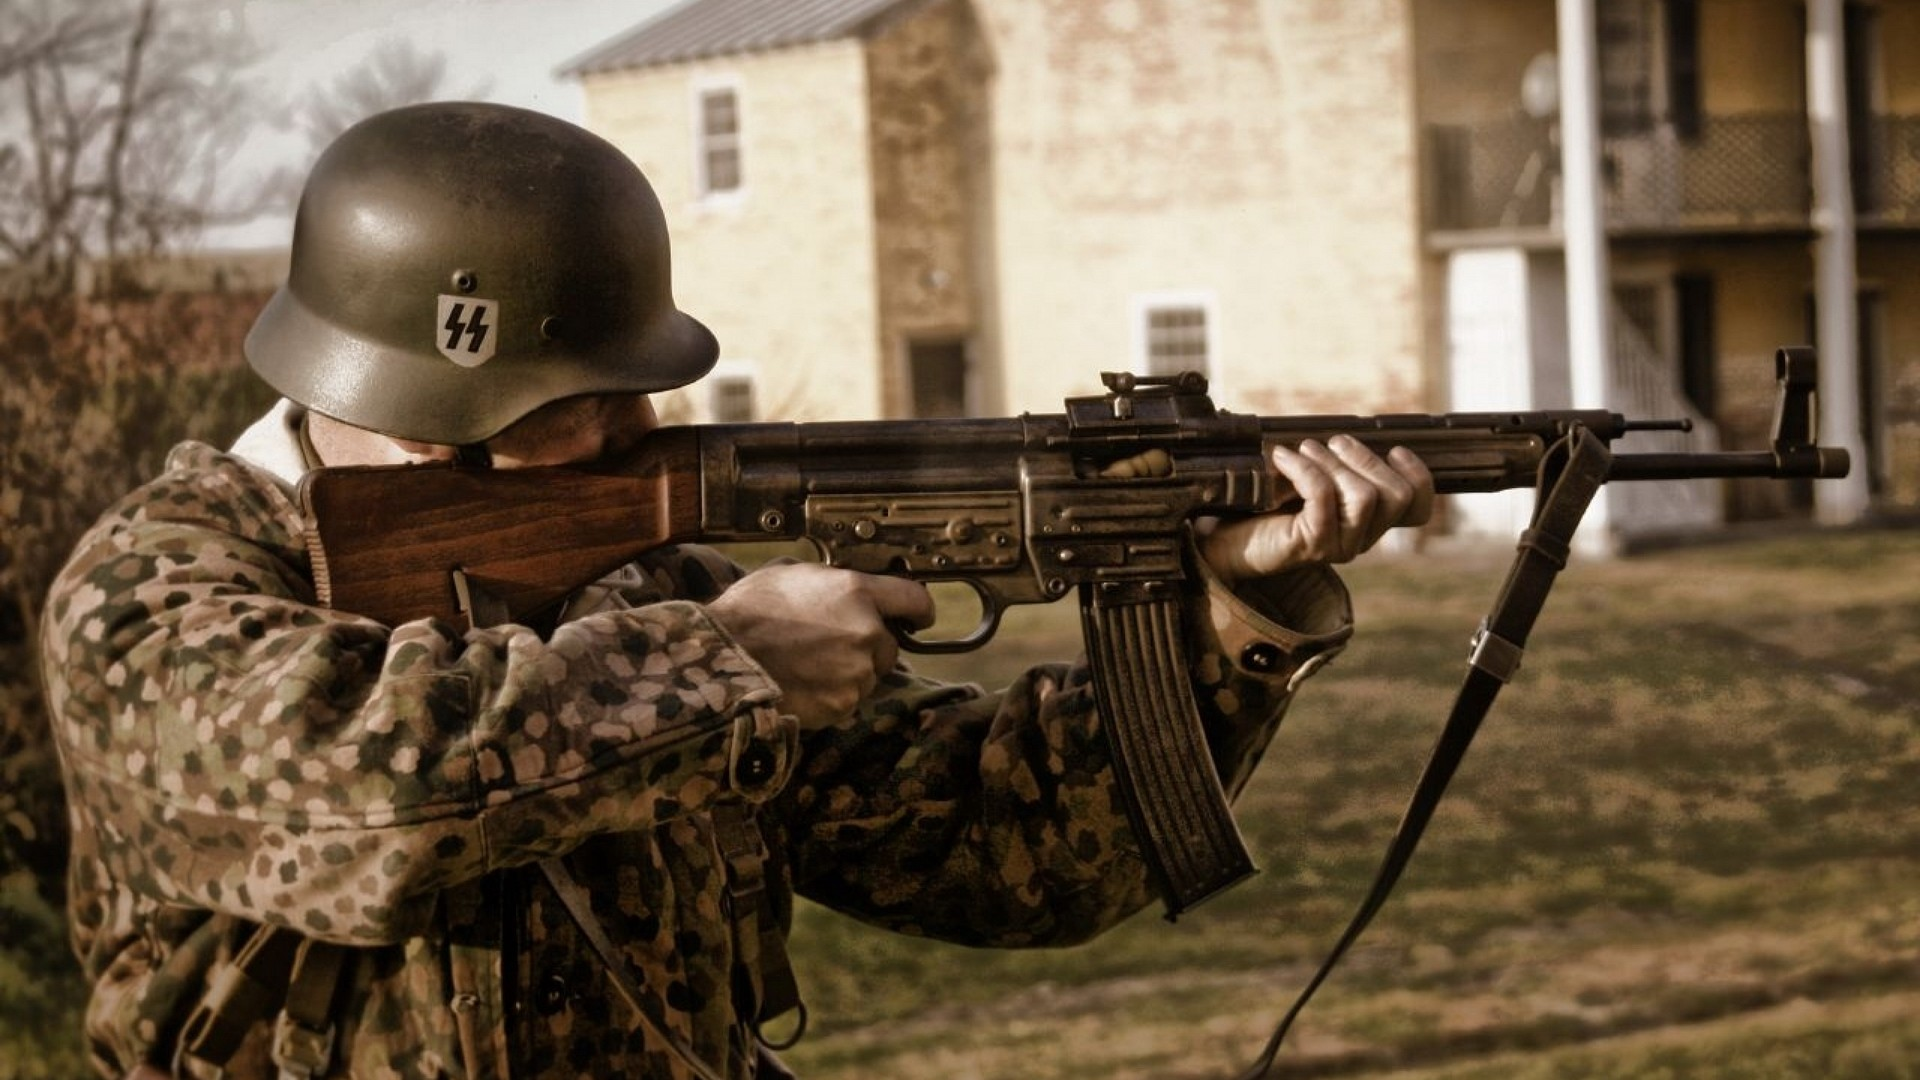 ww2 german army wallpaper - photo #35